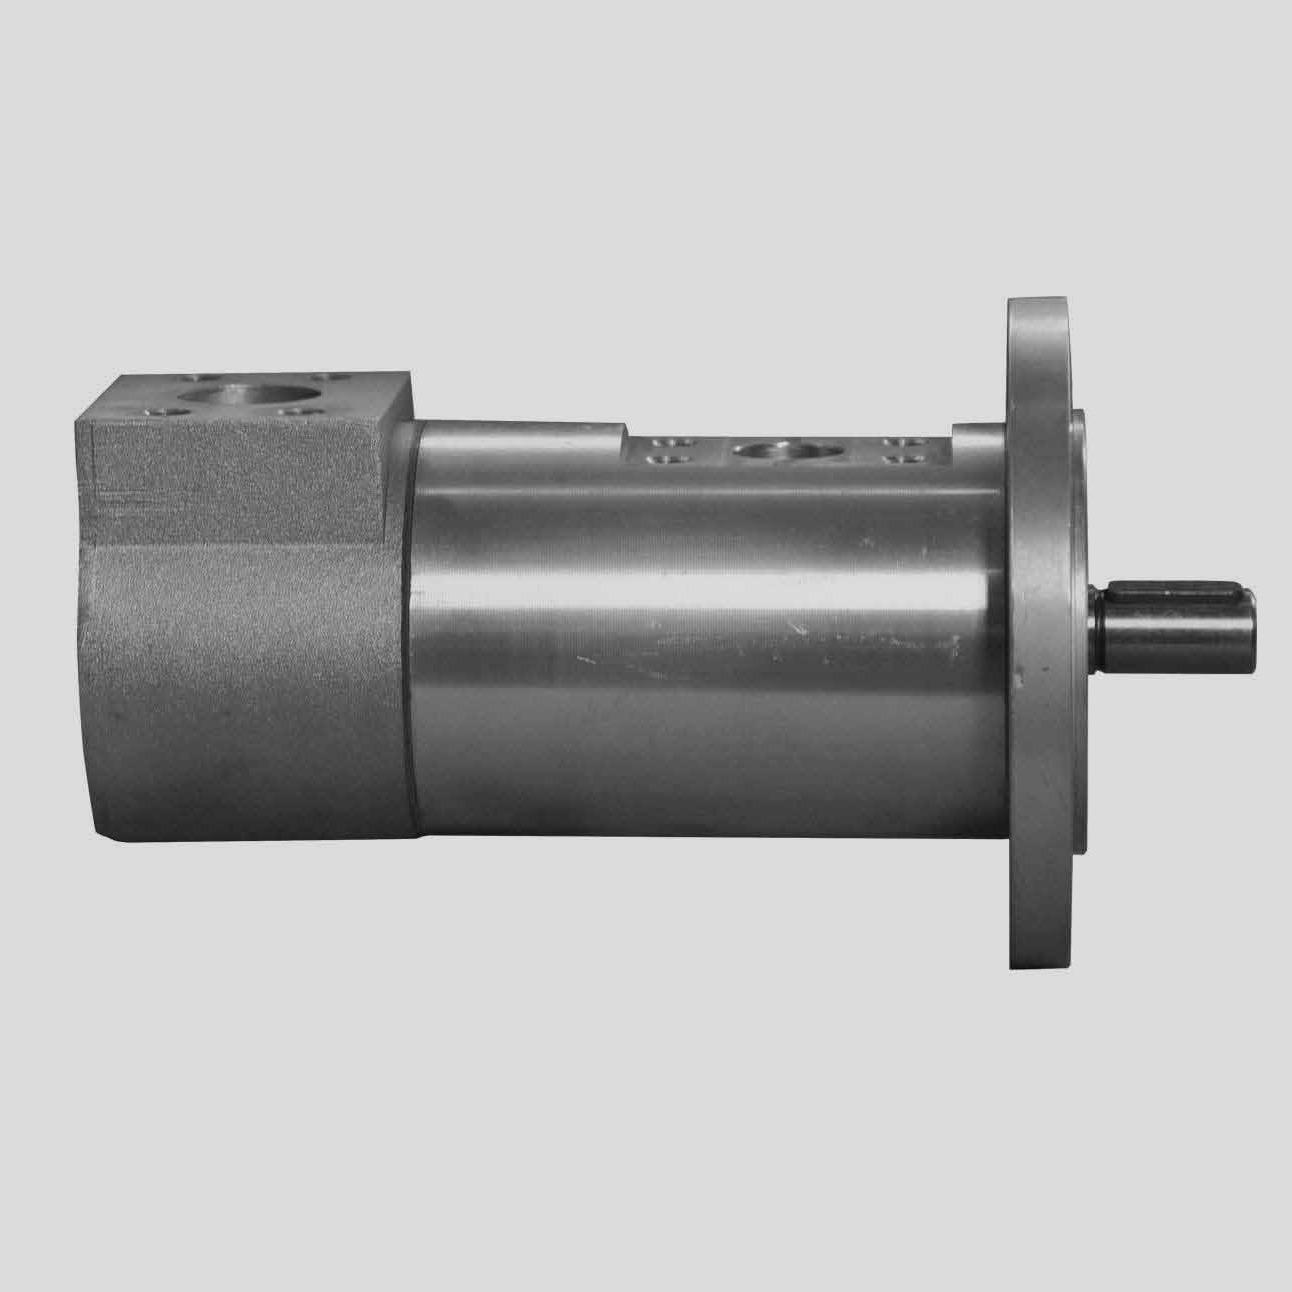 HSA280R46D4PY(黄山螺杆泵流量15m³)